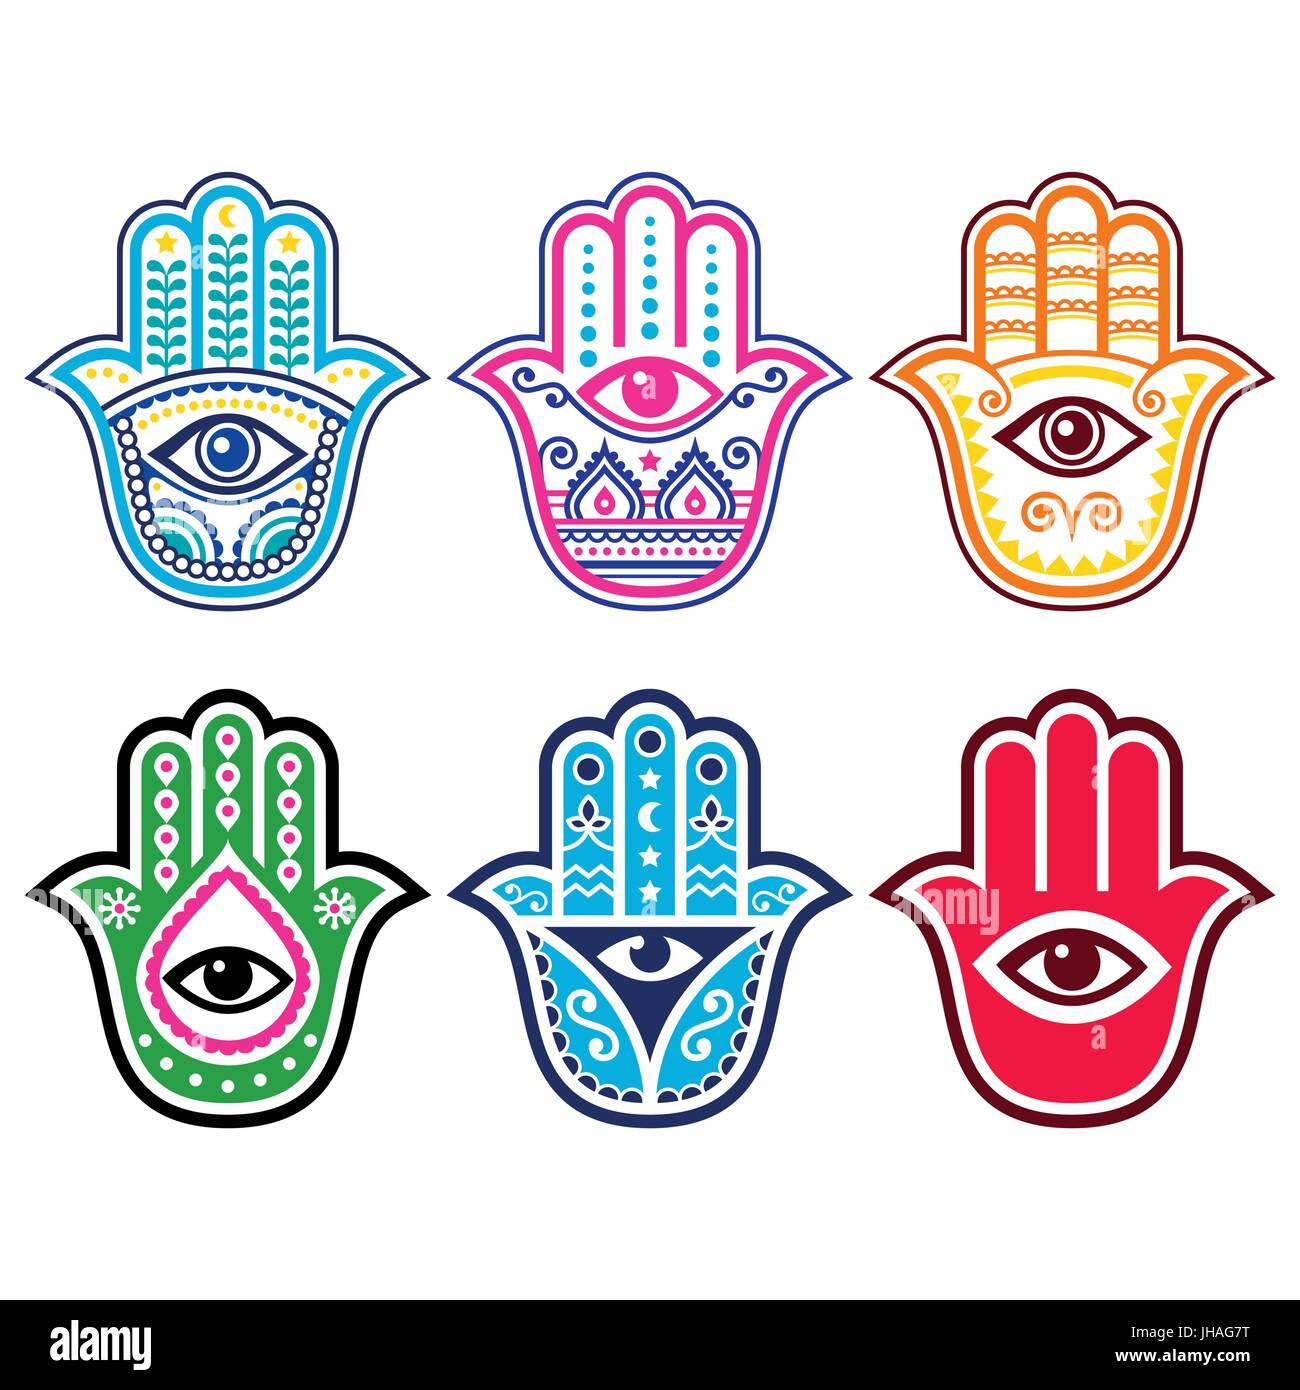 Hamsa hand hand of fatima amulet symbol of protection from hamsa hand hand of fatima amulet symbol of protection from devil eye hamsa hand of fatima symbol of strength and happiness isolated on white biocorpaavc